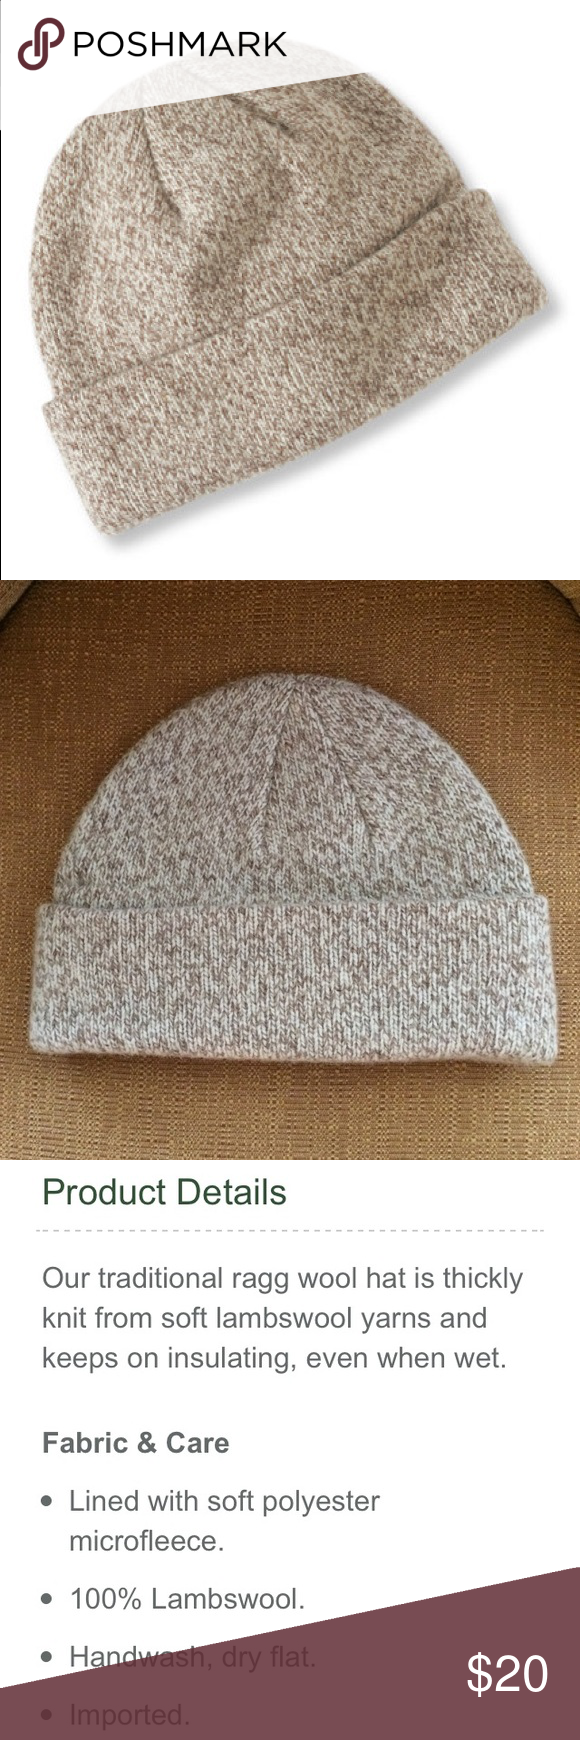 a977c9f59b5 NWOT L.L. Bean Oatmeal Ragg Wool Hat A classic tan lambswool beanie from LL  Bean. 🍁 100% wool